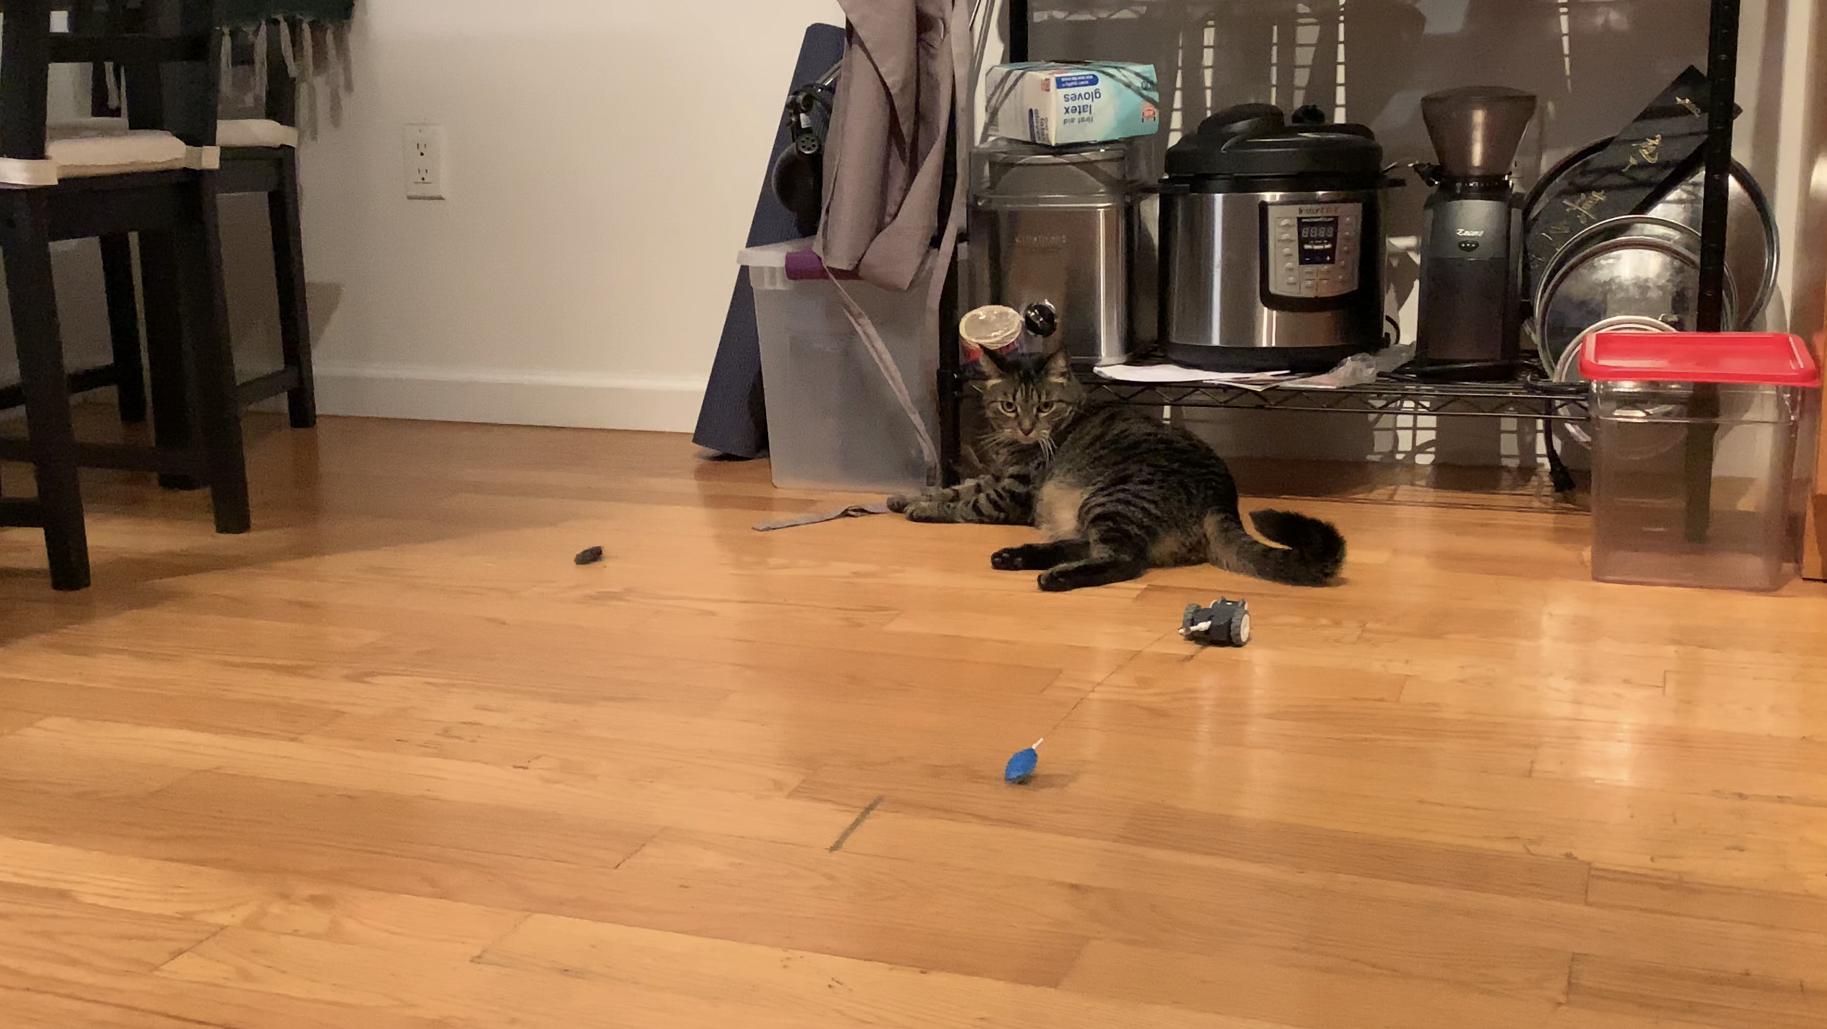 Does your cat need a $150 robot? — Quartz